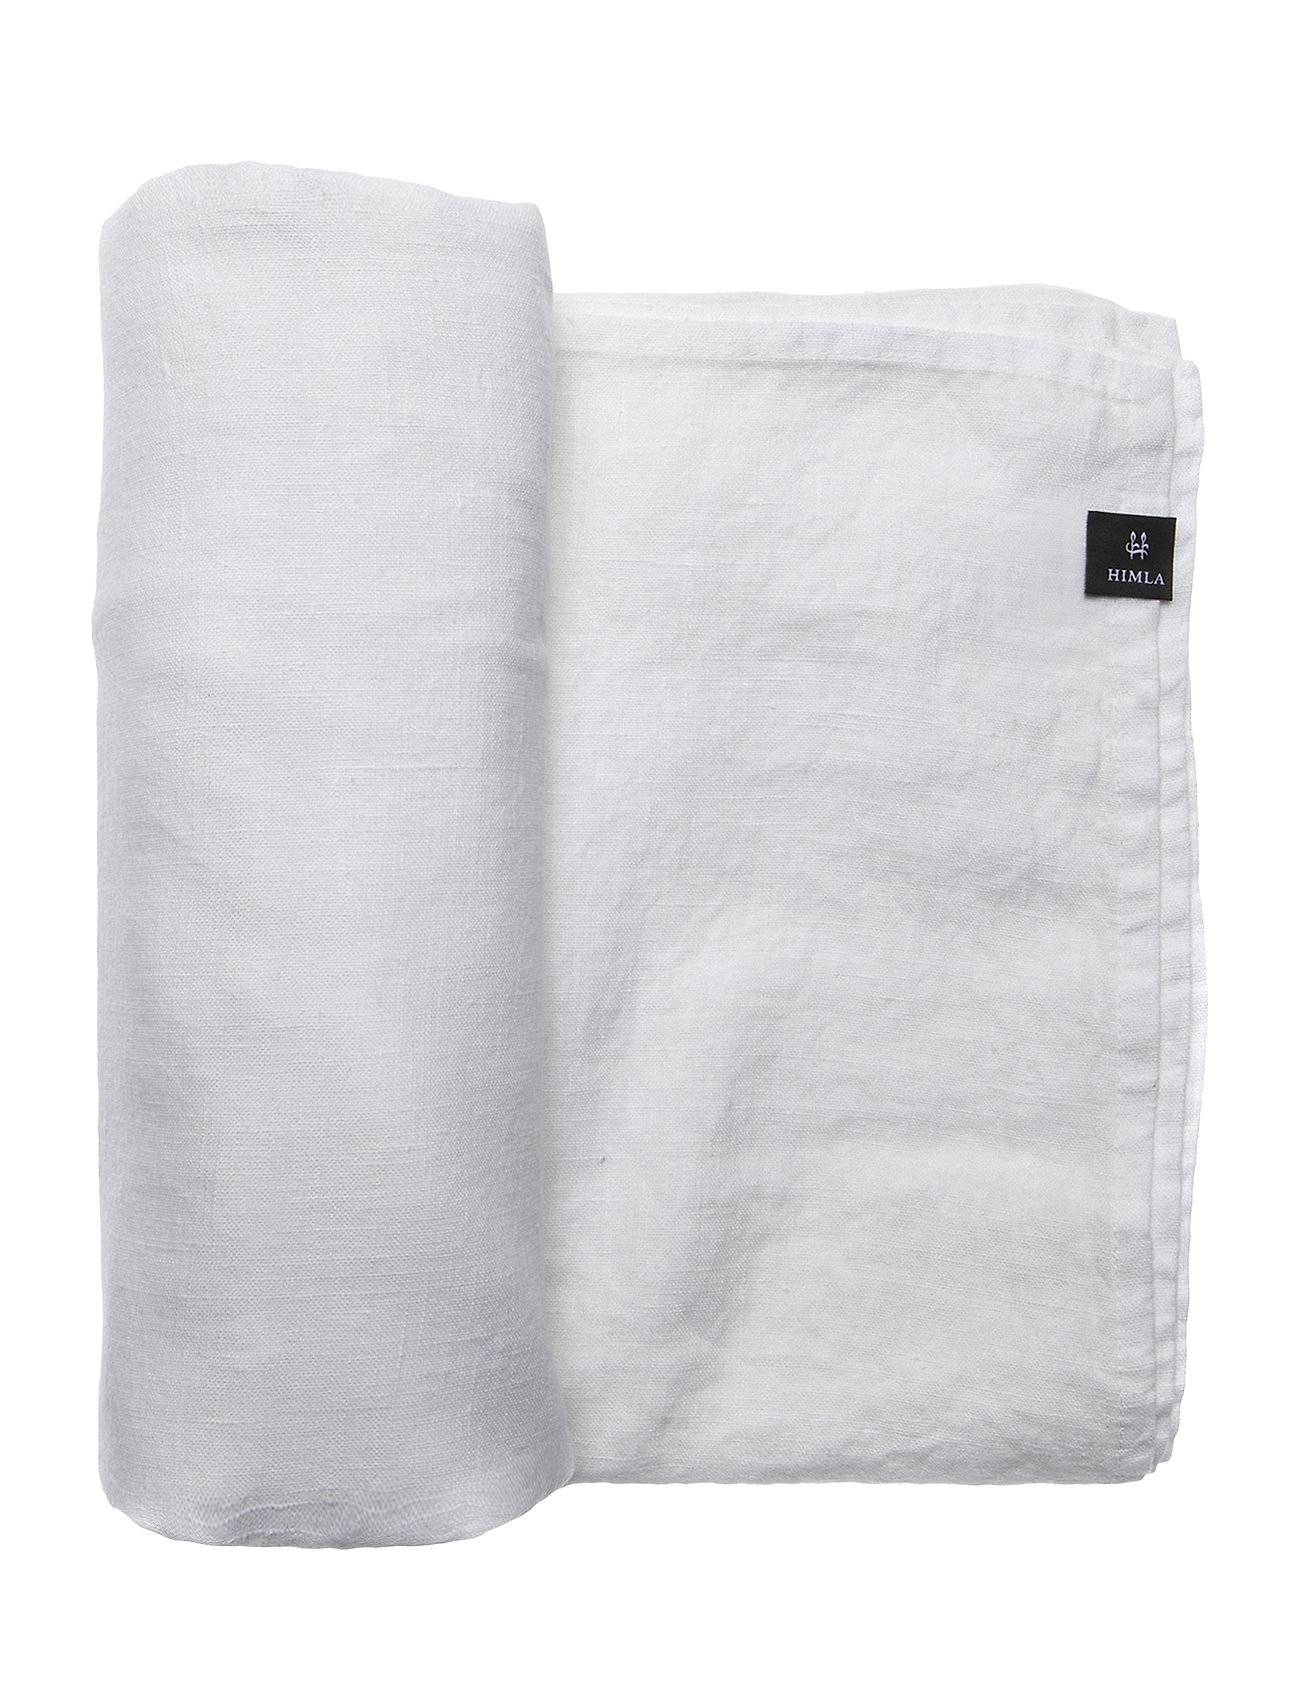 Himla Sunshine Tablecloth Home Kitchen Tablecloth Valkoinen Himla